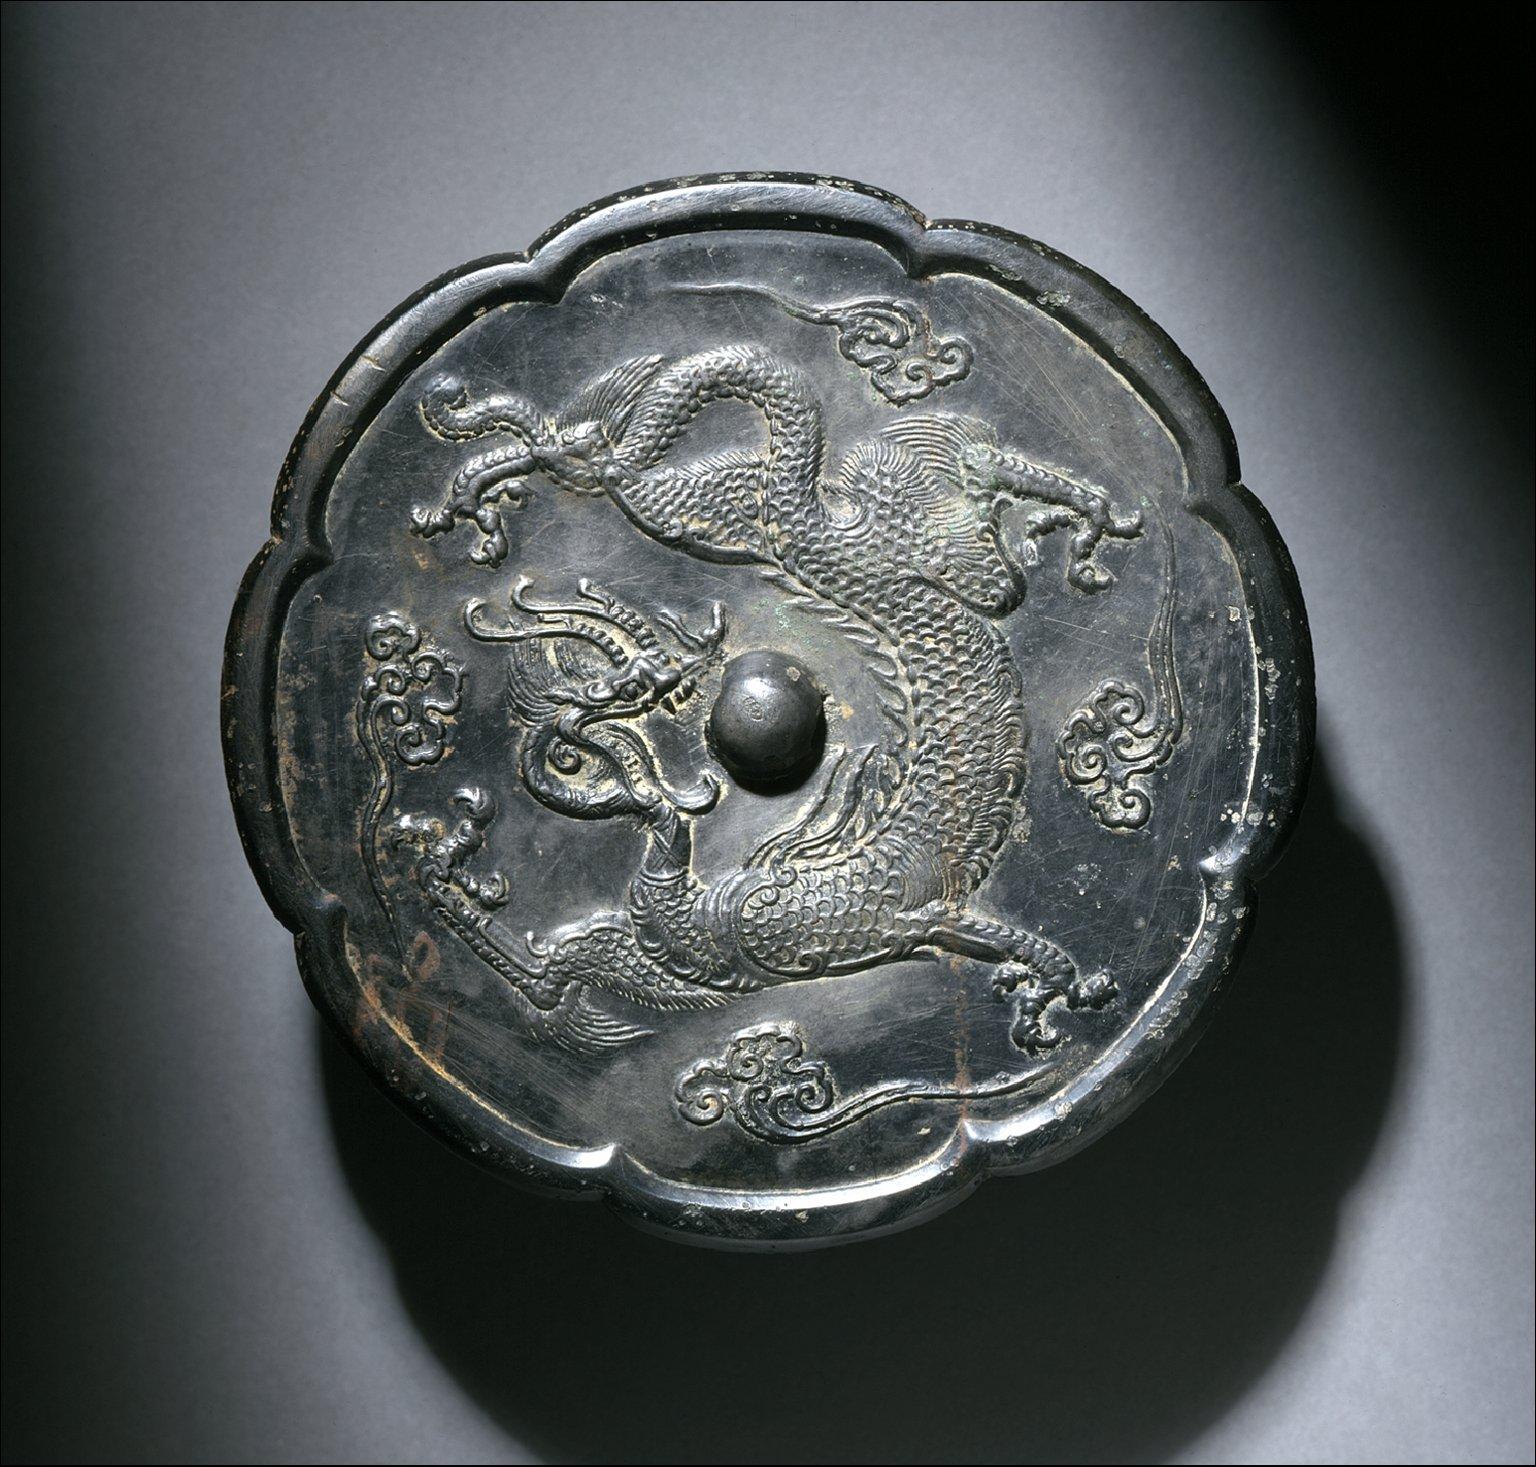 Lobed Mirror (Jing) with Dragon